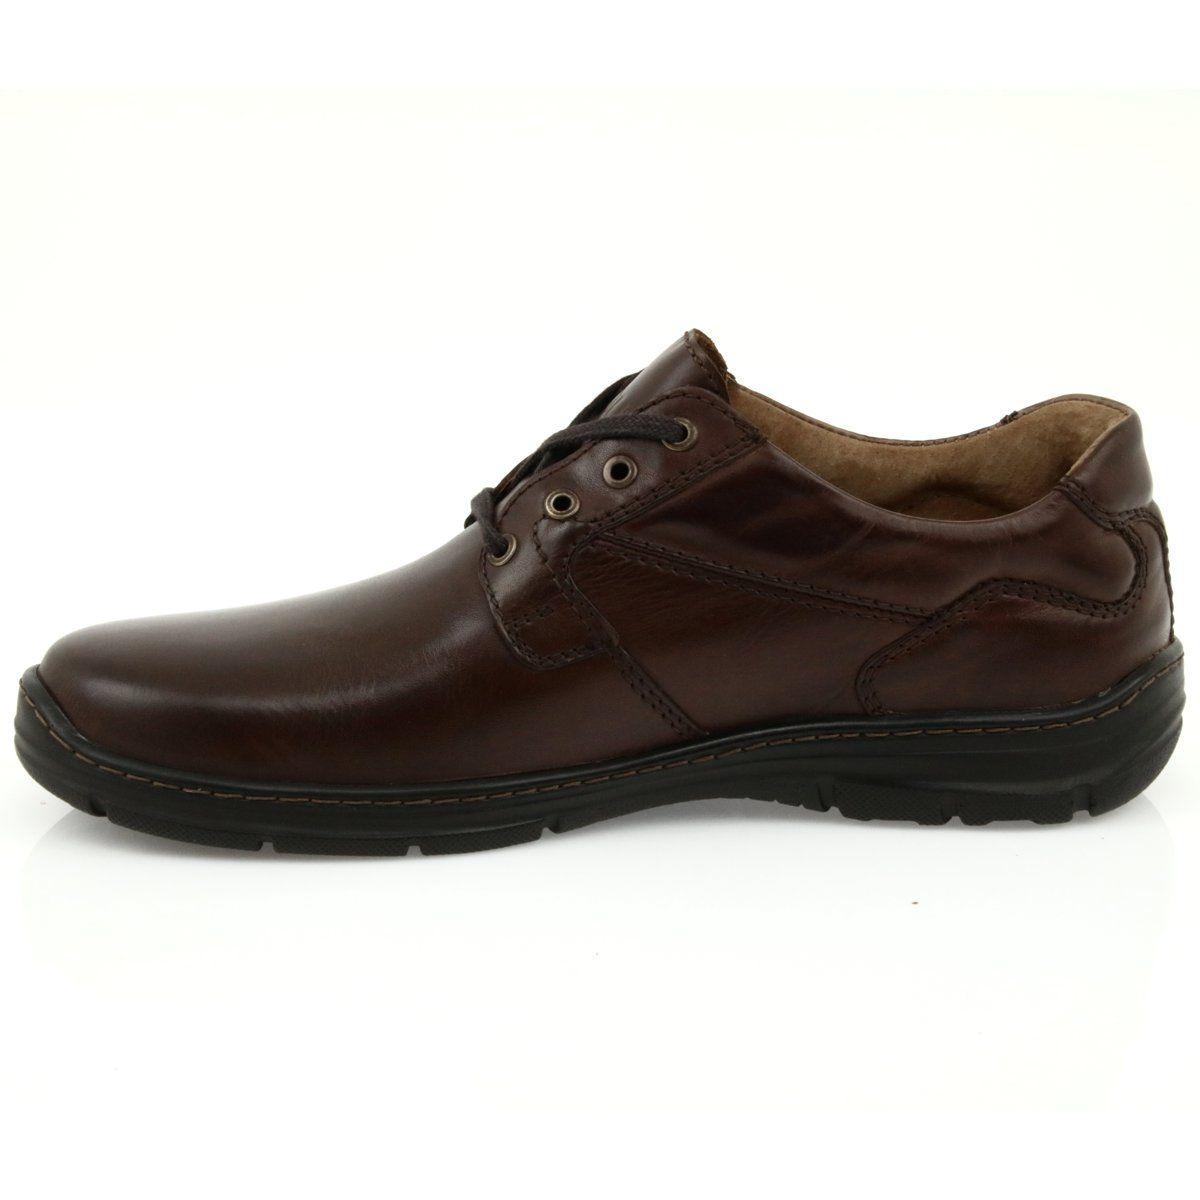 Badura Buty Meskie Komfort 3509 Brazowe Dress Shoes Men Oxford Shoes Chukka Boots